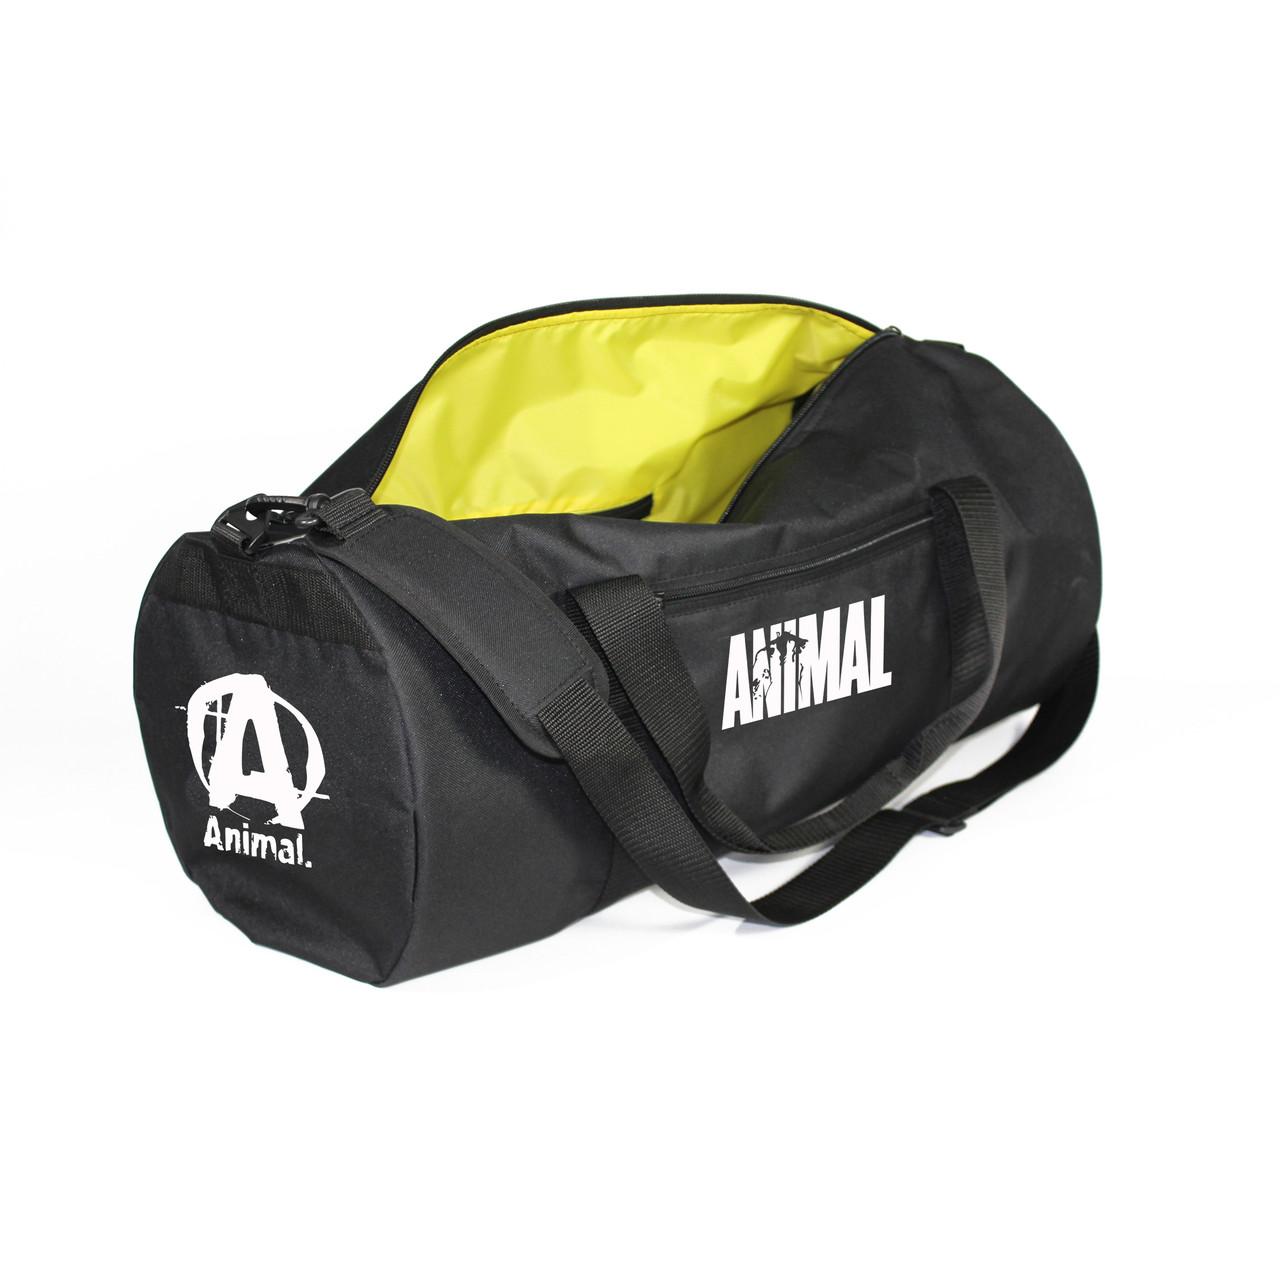 Спортивная сумка Animal 40L бел. (реплика)